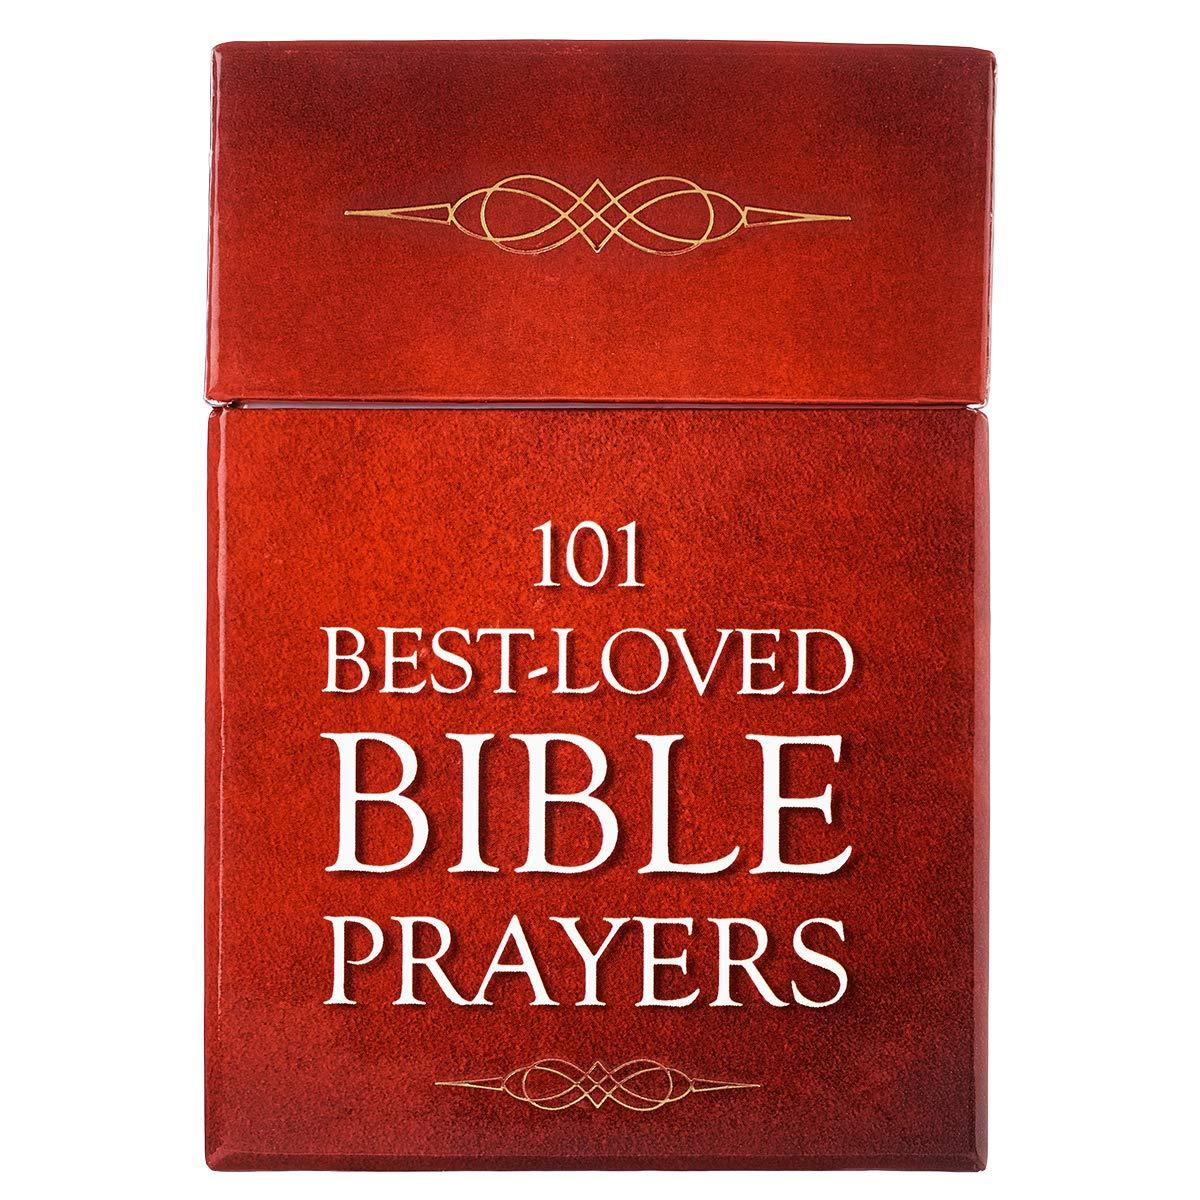 101 BEST LOVED BIBLE PRAYERS BOX OF BLESSINGS